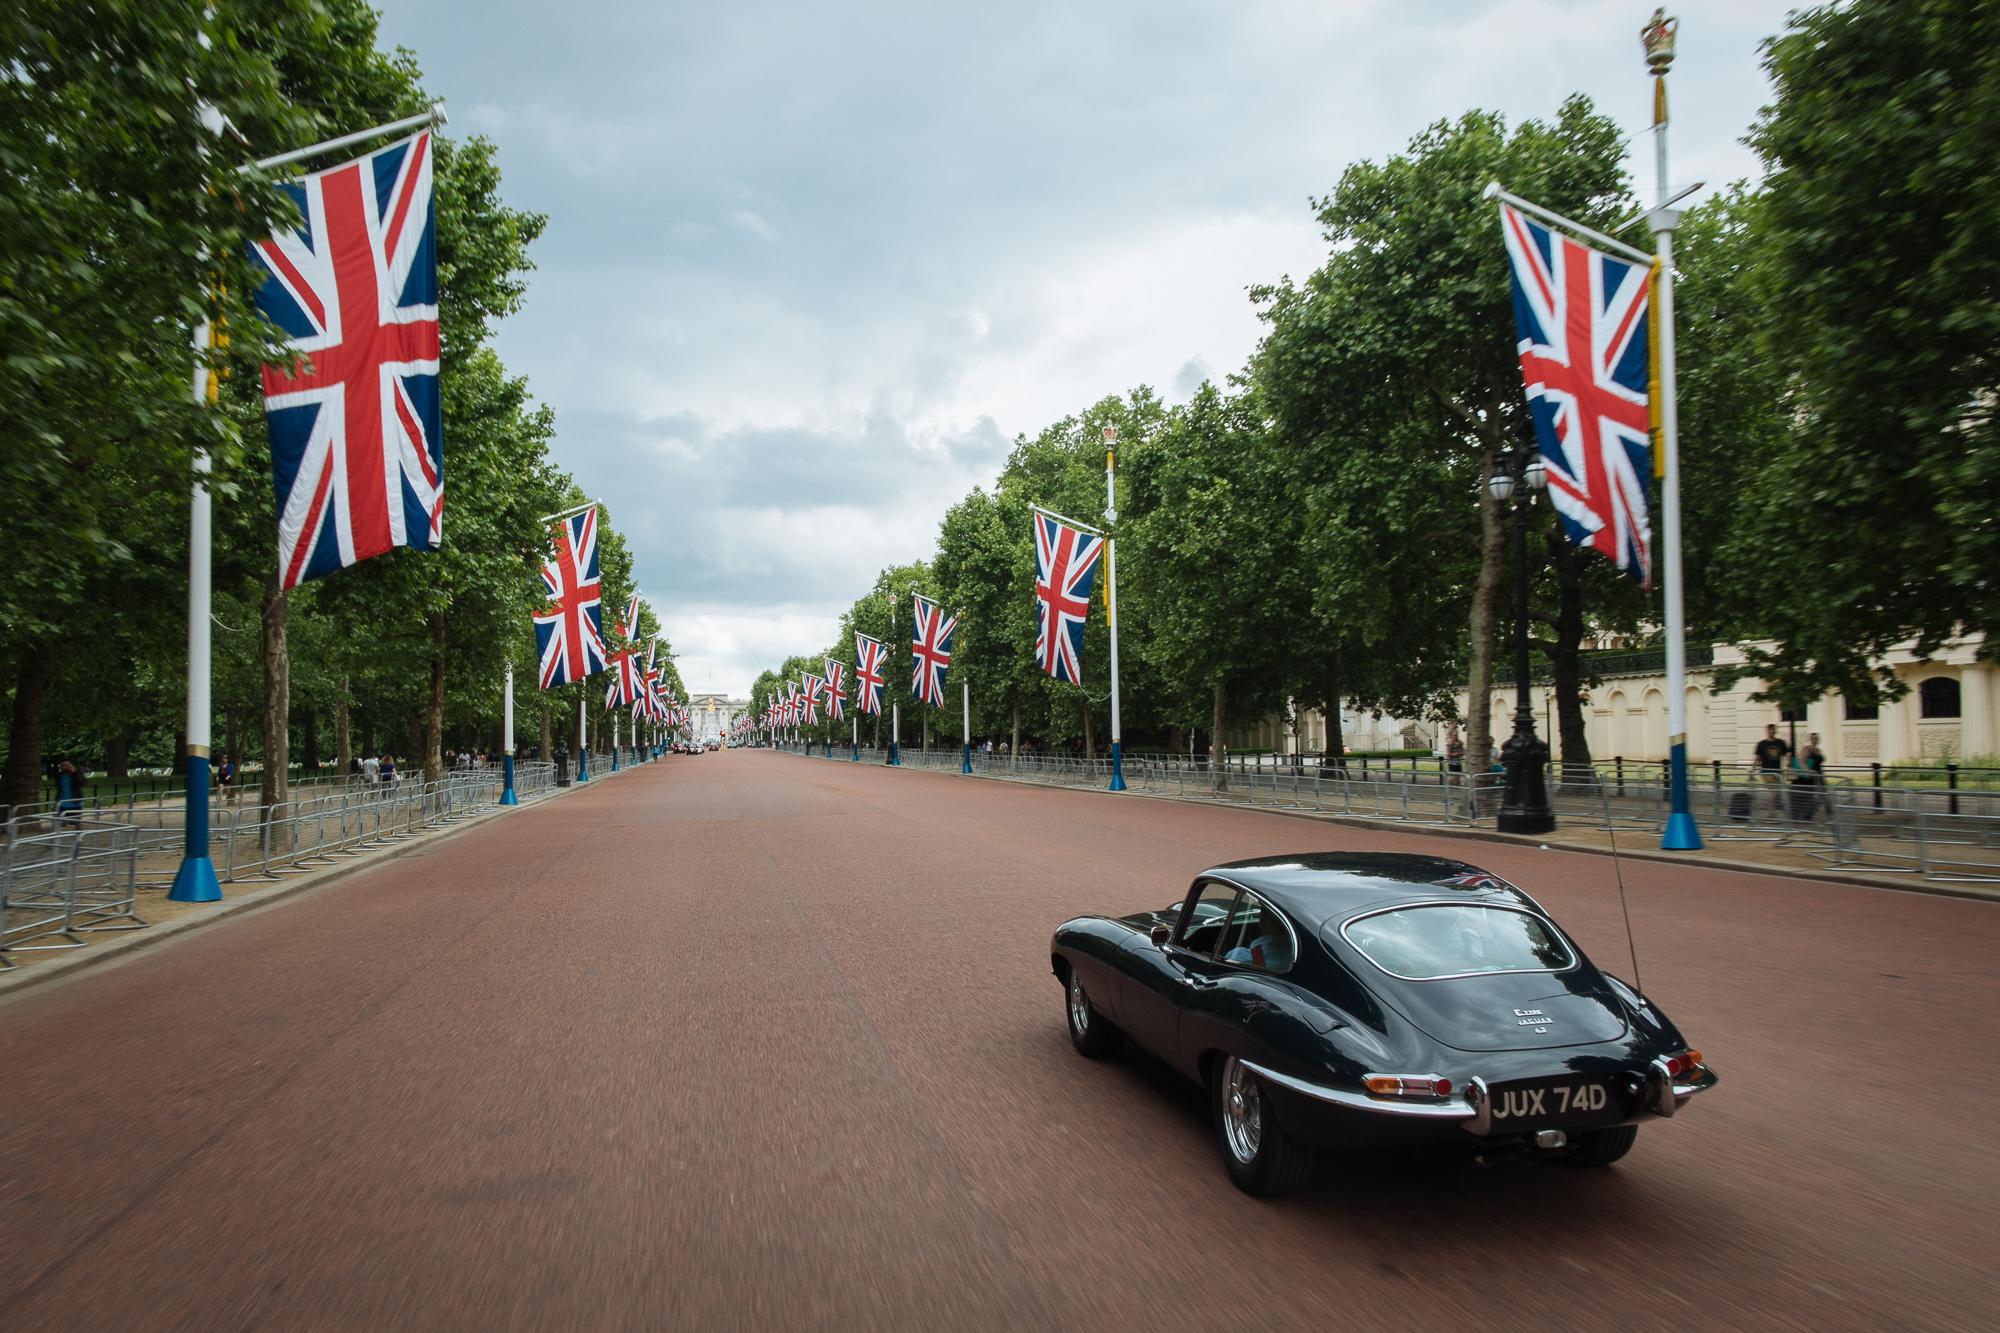 Gideon_Lang_Laddie_Gideons_Agency_Roadshow_London_Events_Photographer-44.jpg